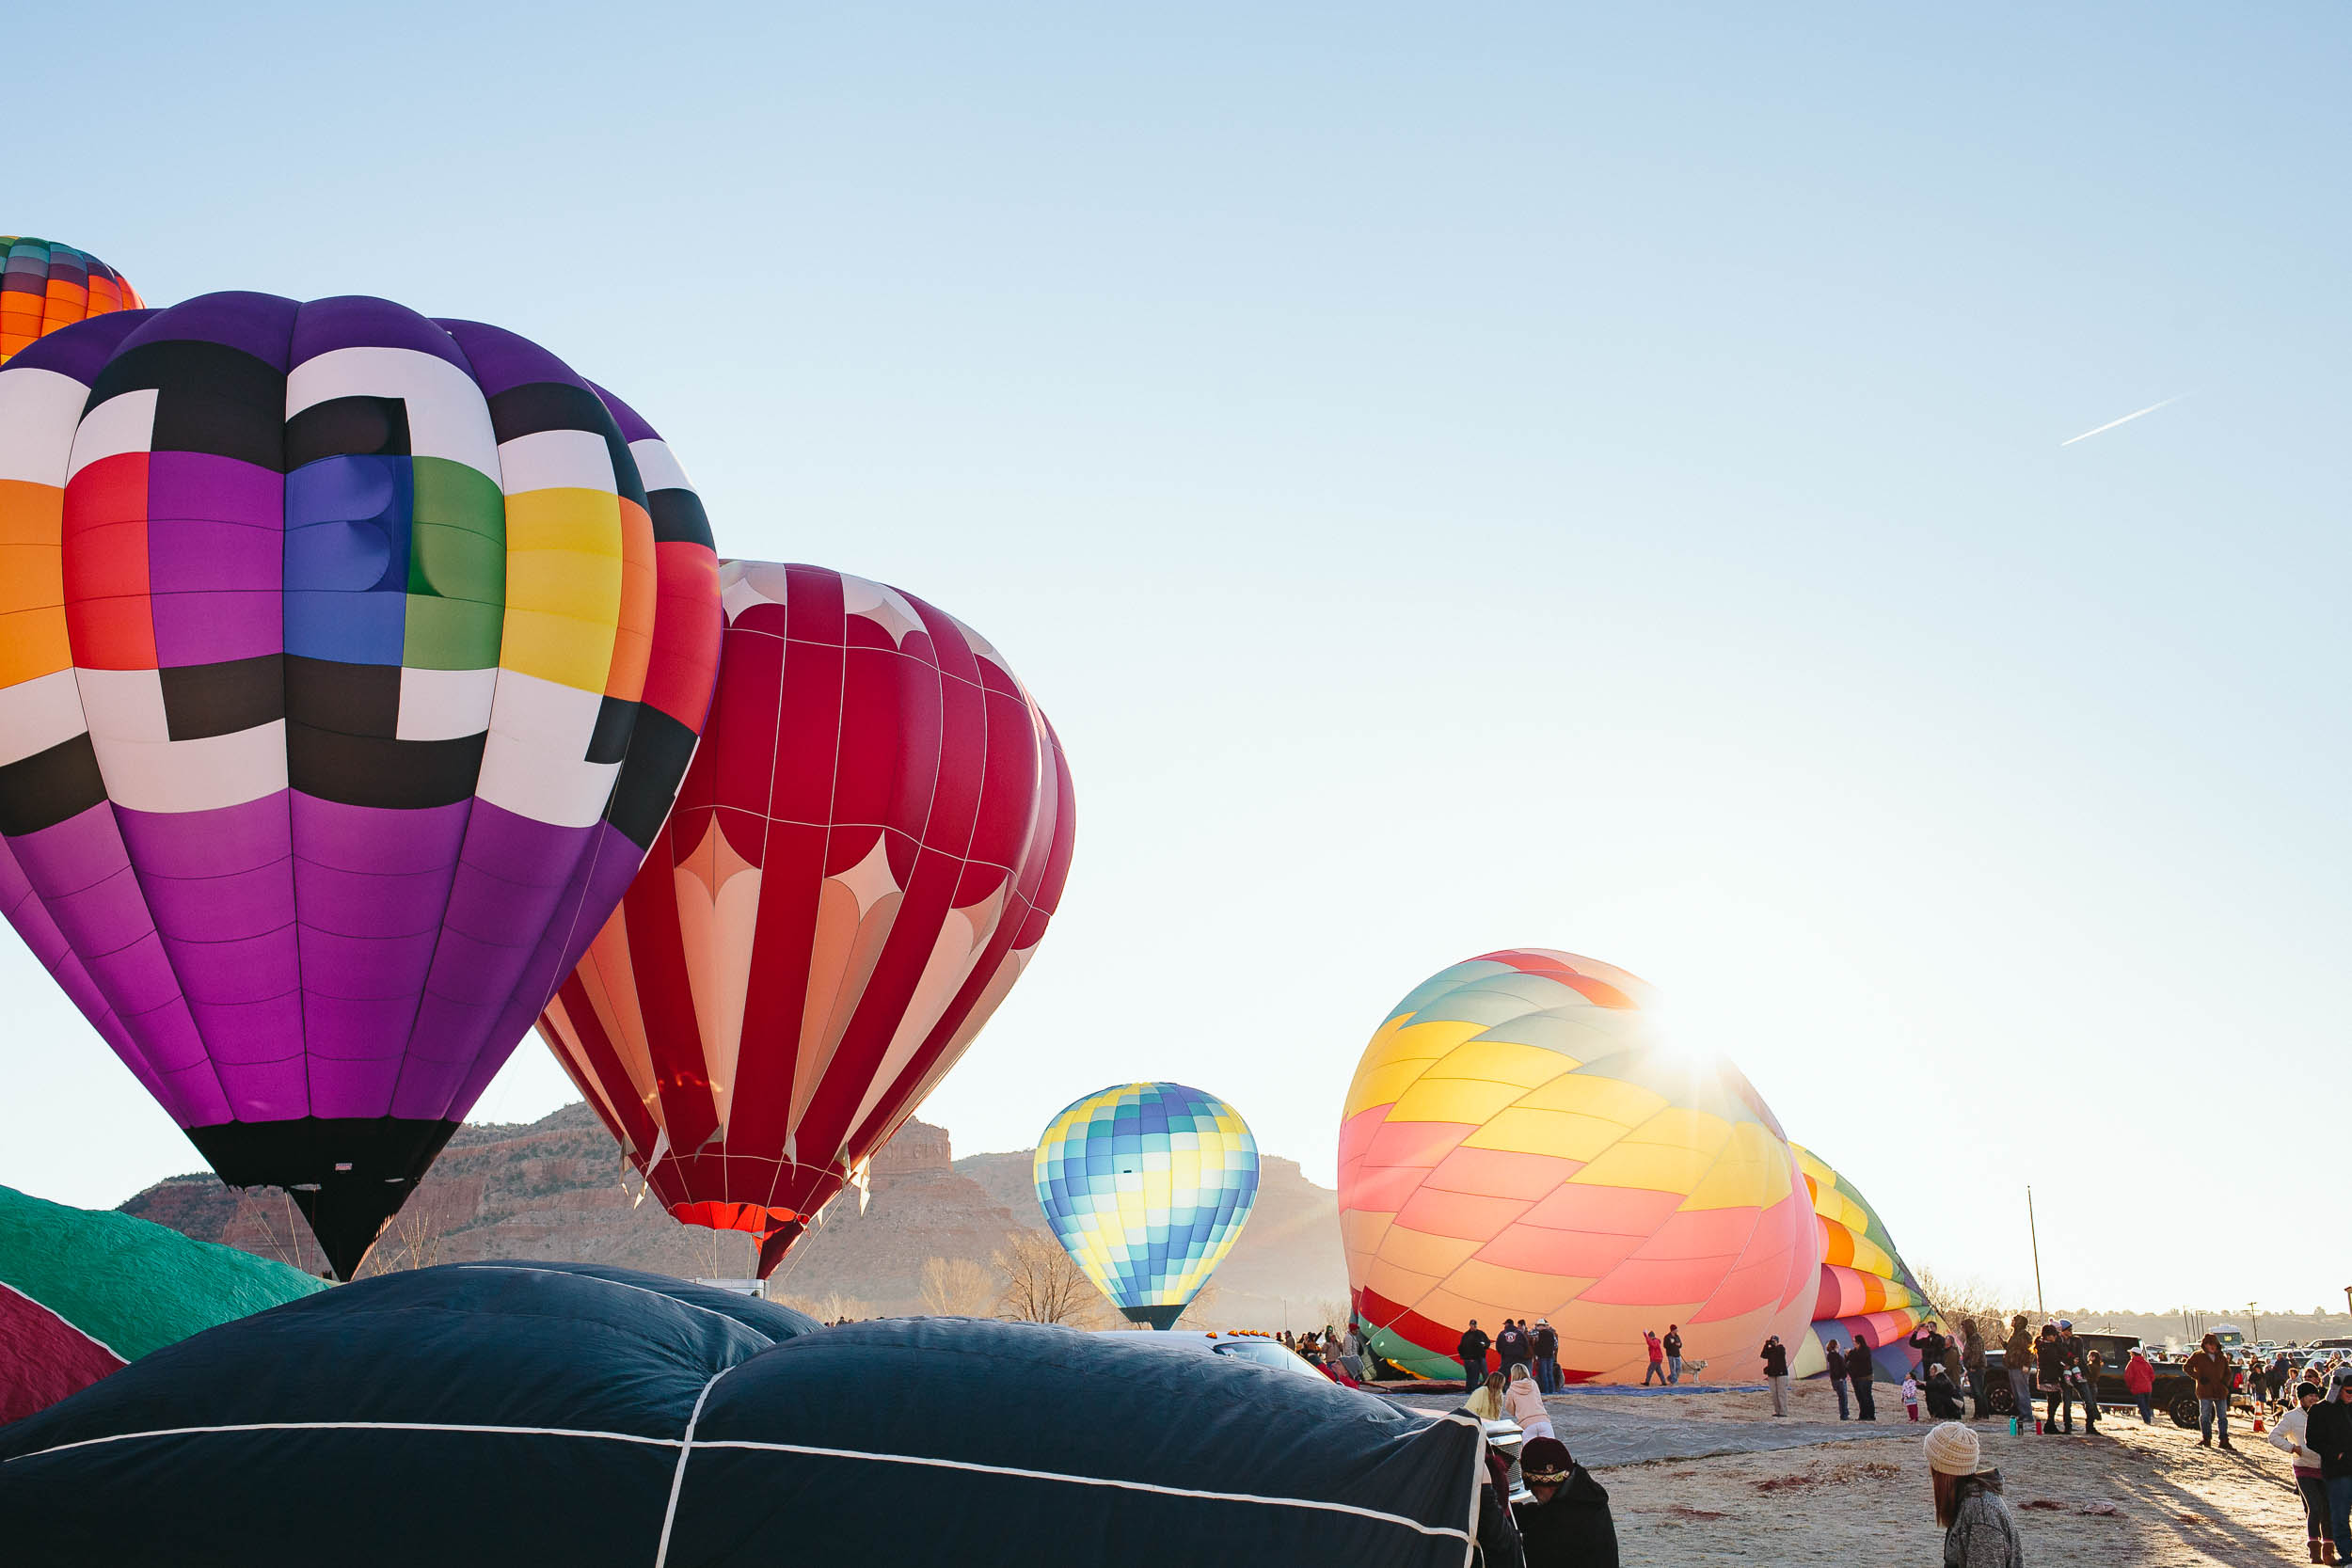 Kyle-Sheppard-Kanab-Balloon-Festival-8.jpg